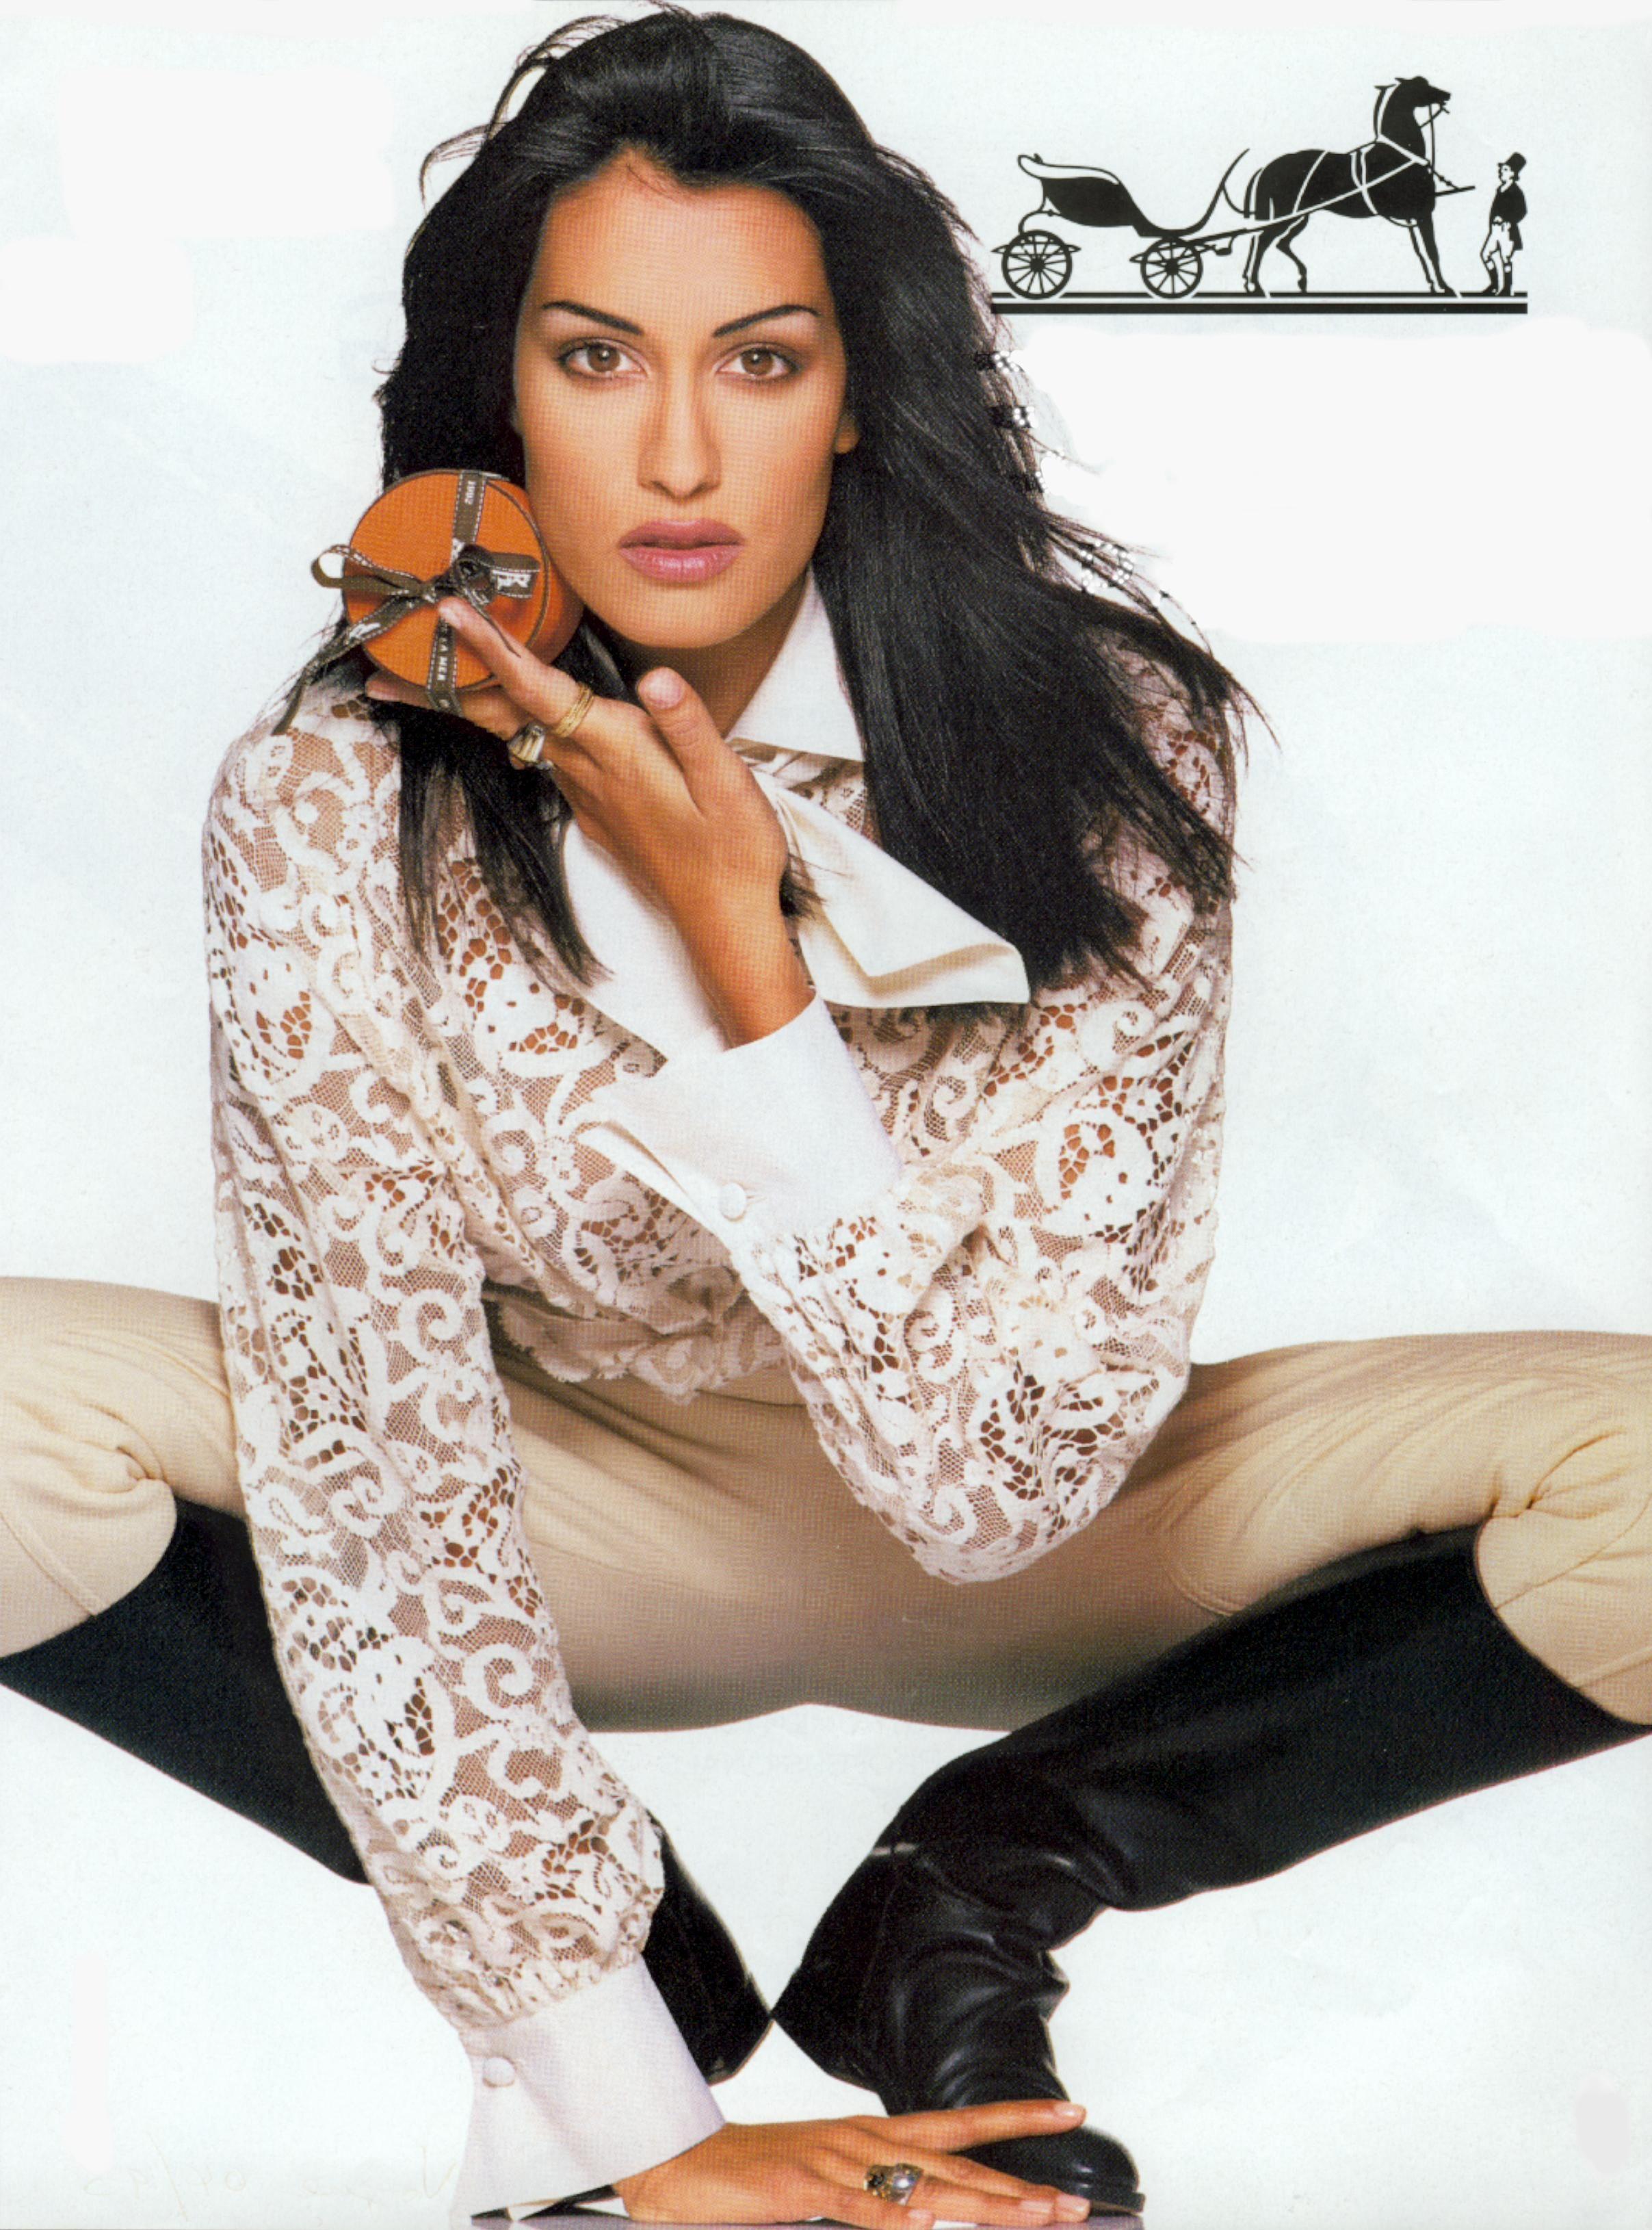 best hd photos wallpapers pics of yasmeen ghauri | modèle - gauhri